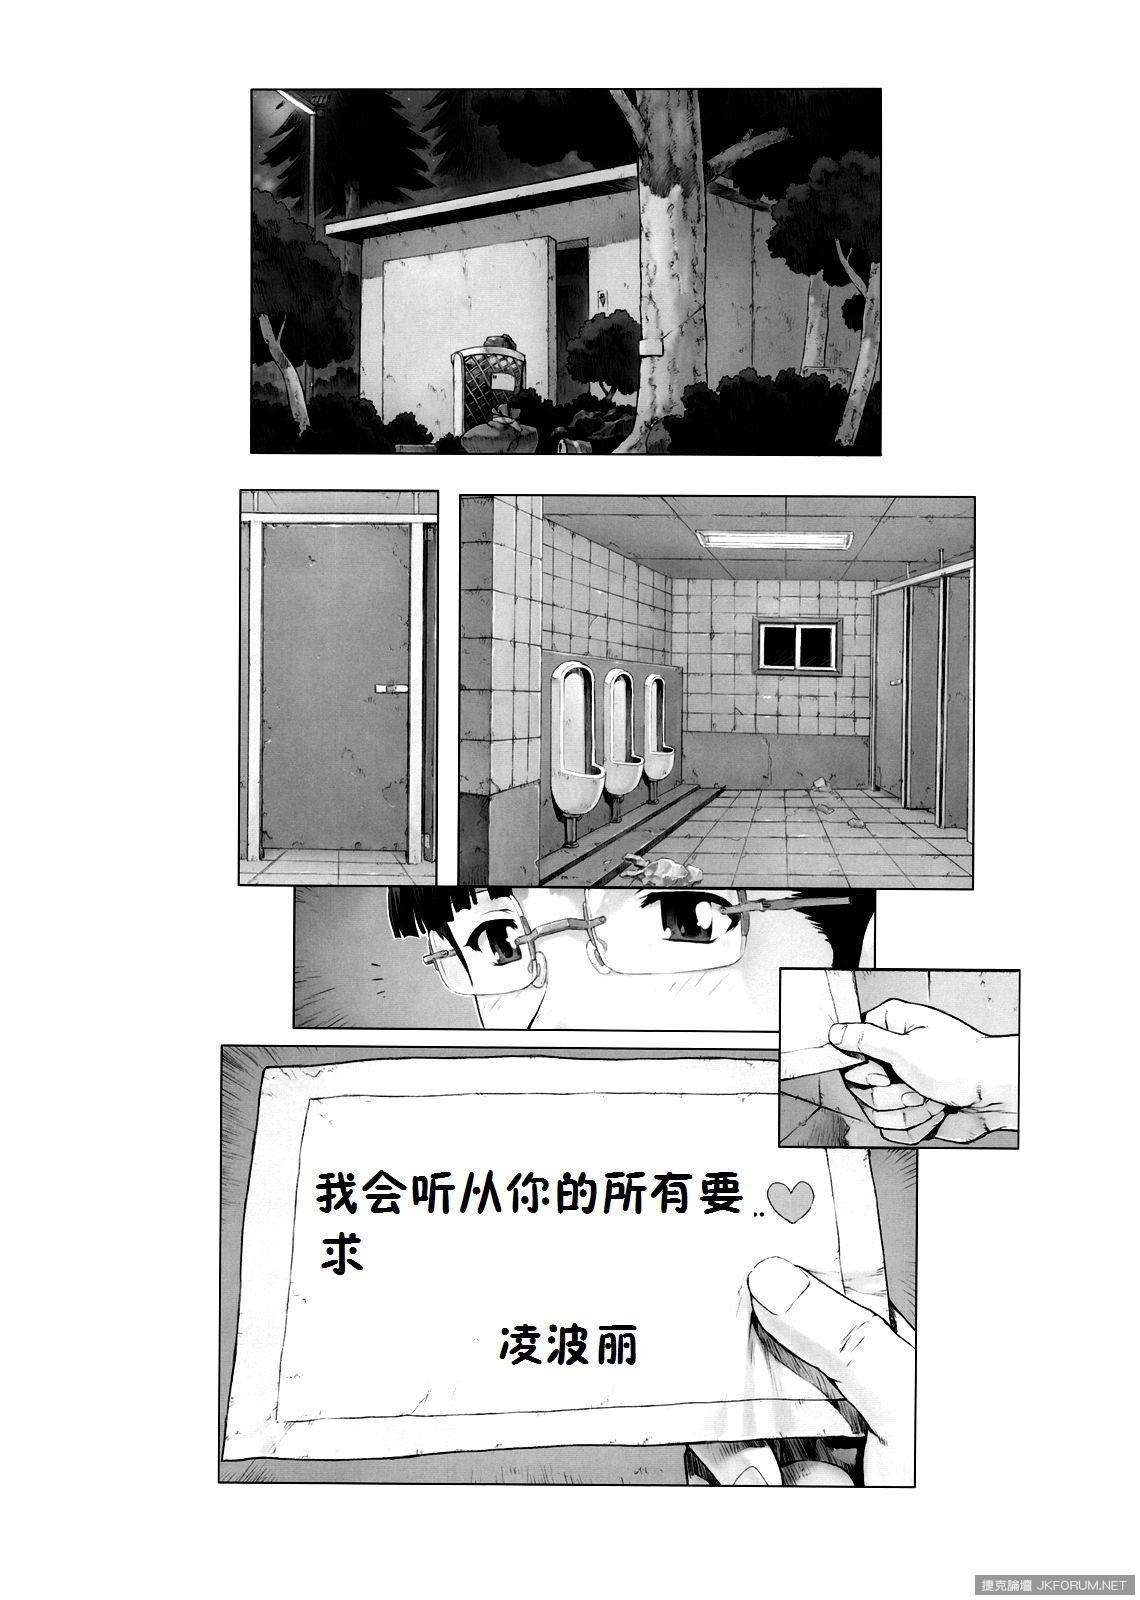 NEW_02.jpg